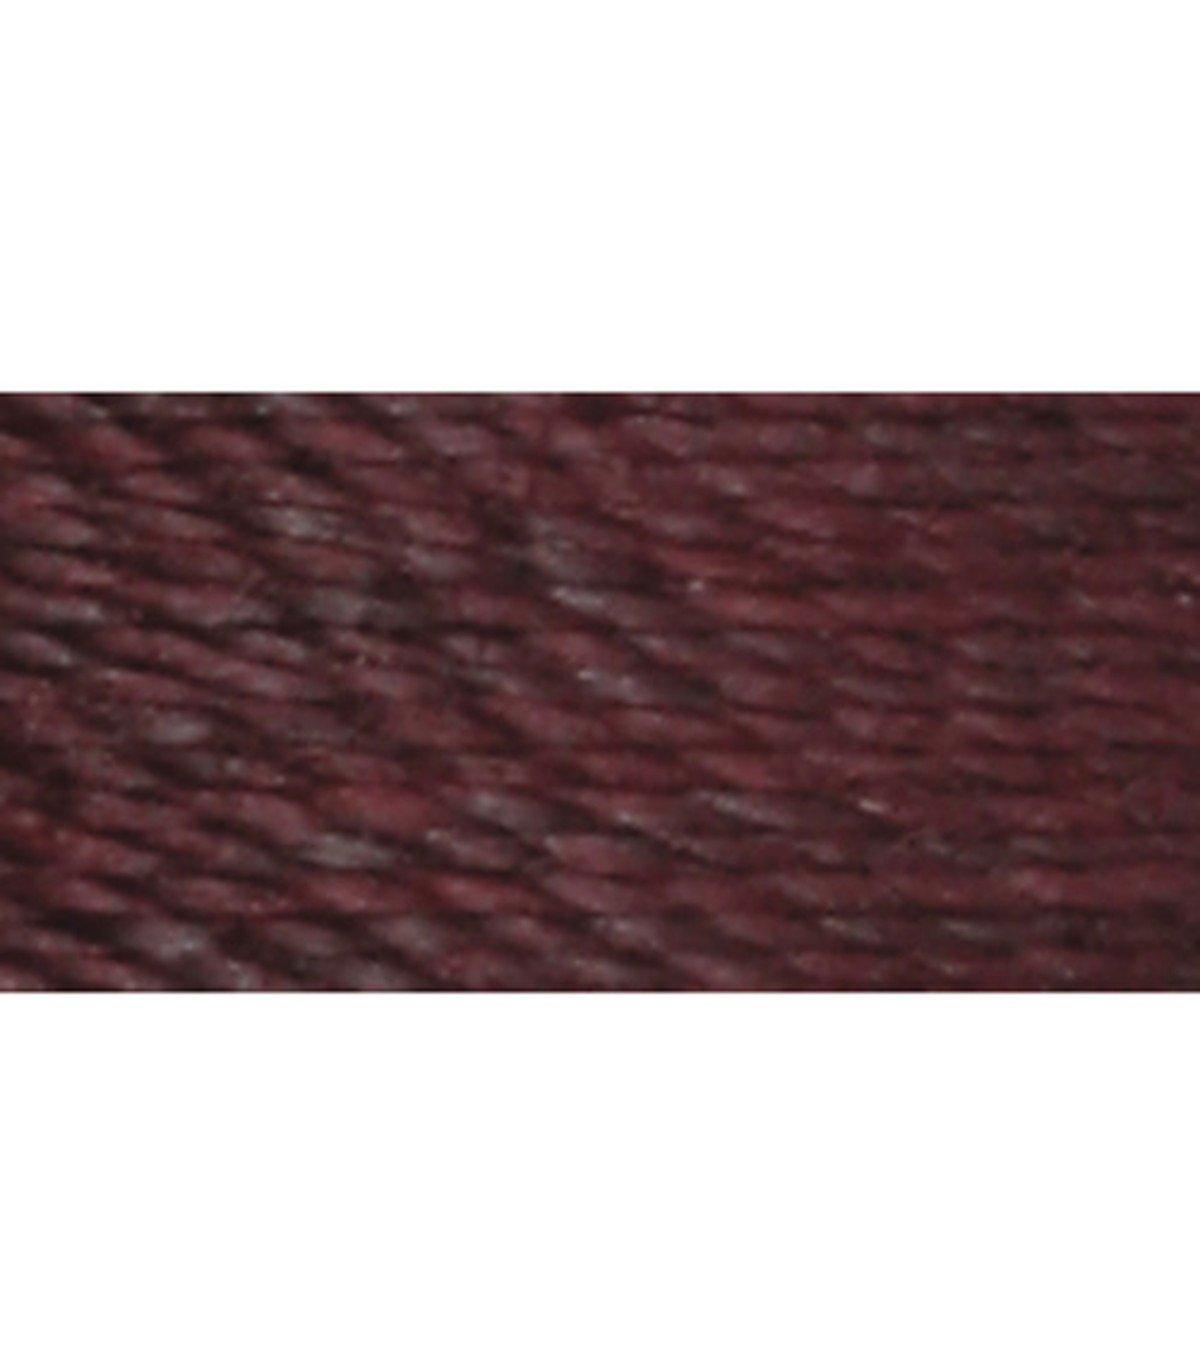 Coats Thread & Zippers S950-0900 S950-0900 and CLARK Dual Duty XP Heavy, 125-Yard, Black